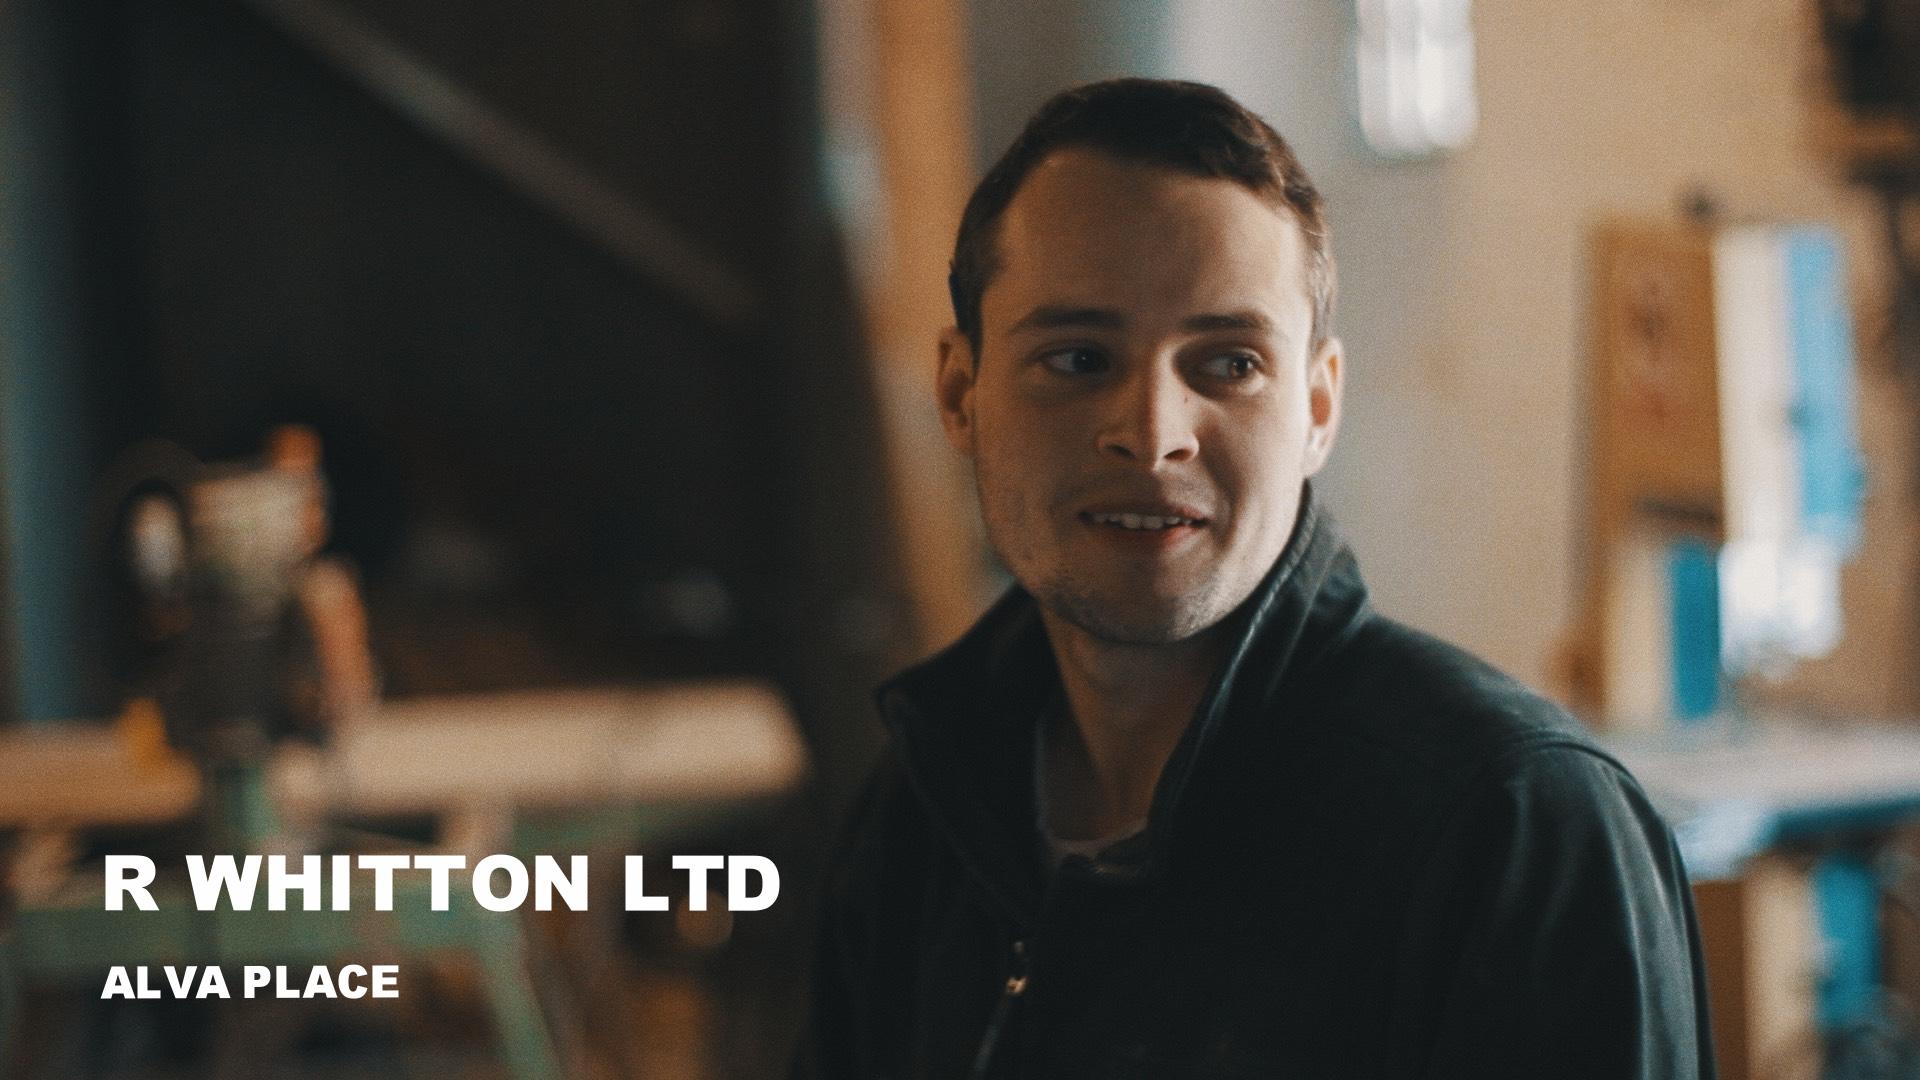 R Whitton Ltd - Alva Place (Episode 1) Peacock Turner Media